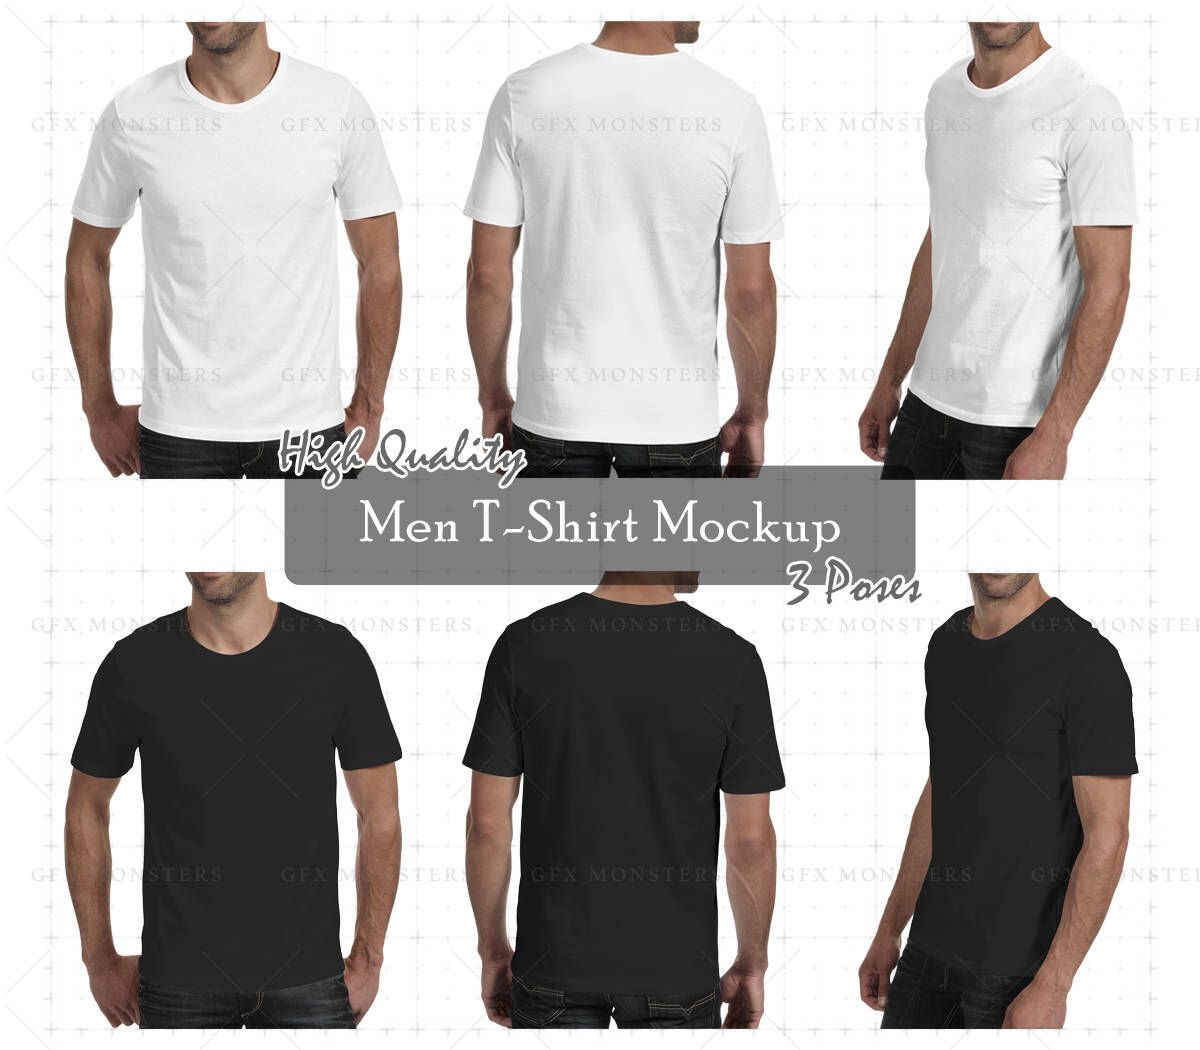 Download Men T Shirt Mockup Psd Front Back Perspective Png Psd Apparel Mock Up High Resolution Mock Up Instant Download Kaos Ide Kostum Desain Pakaian